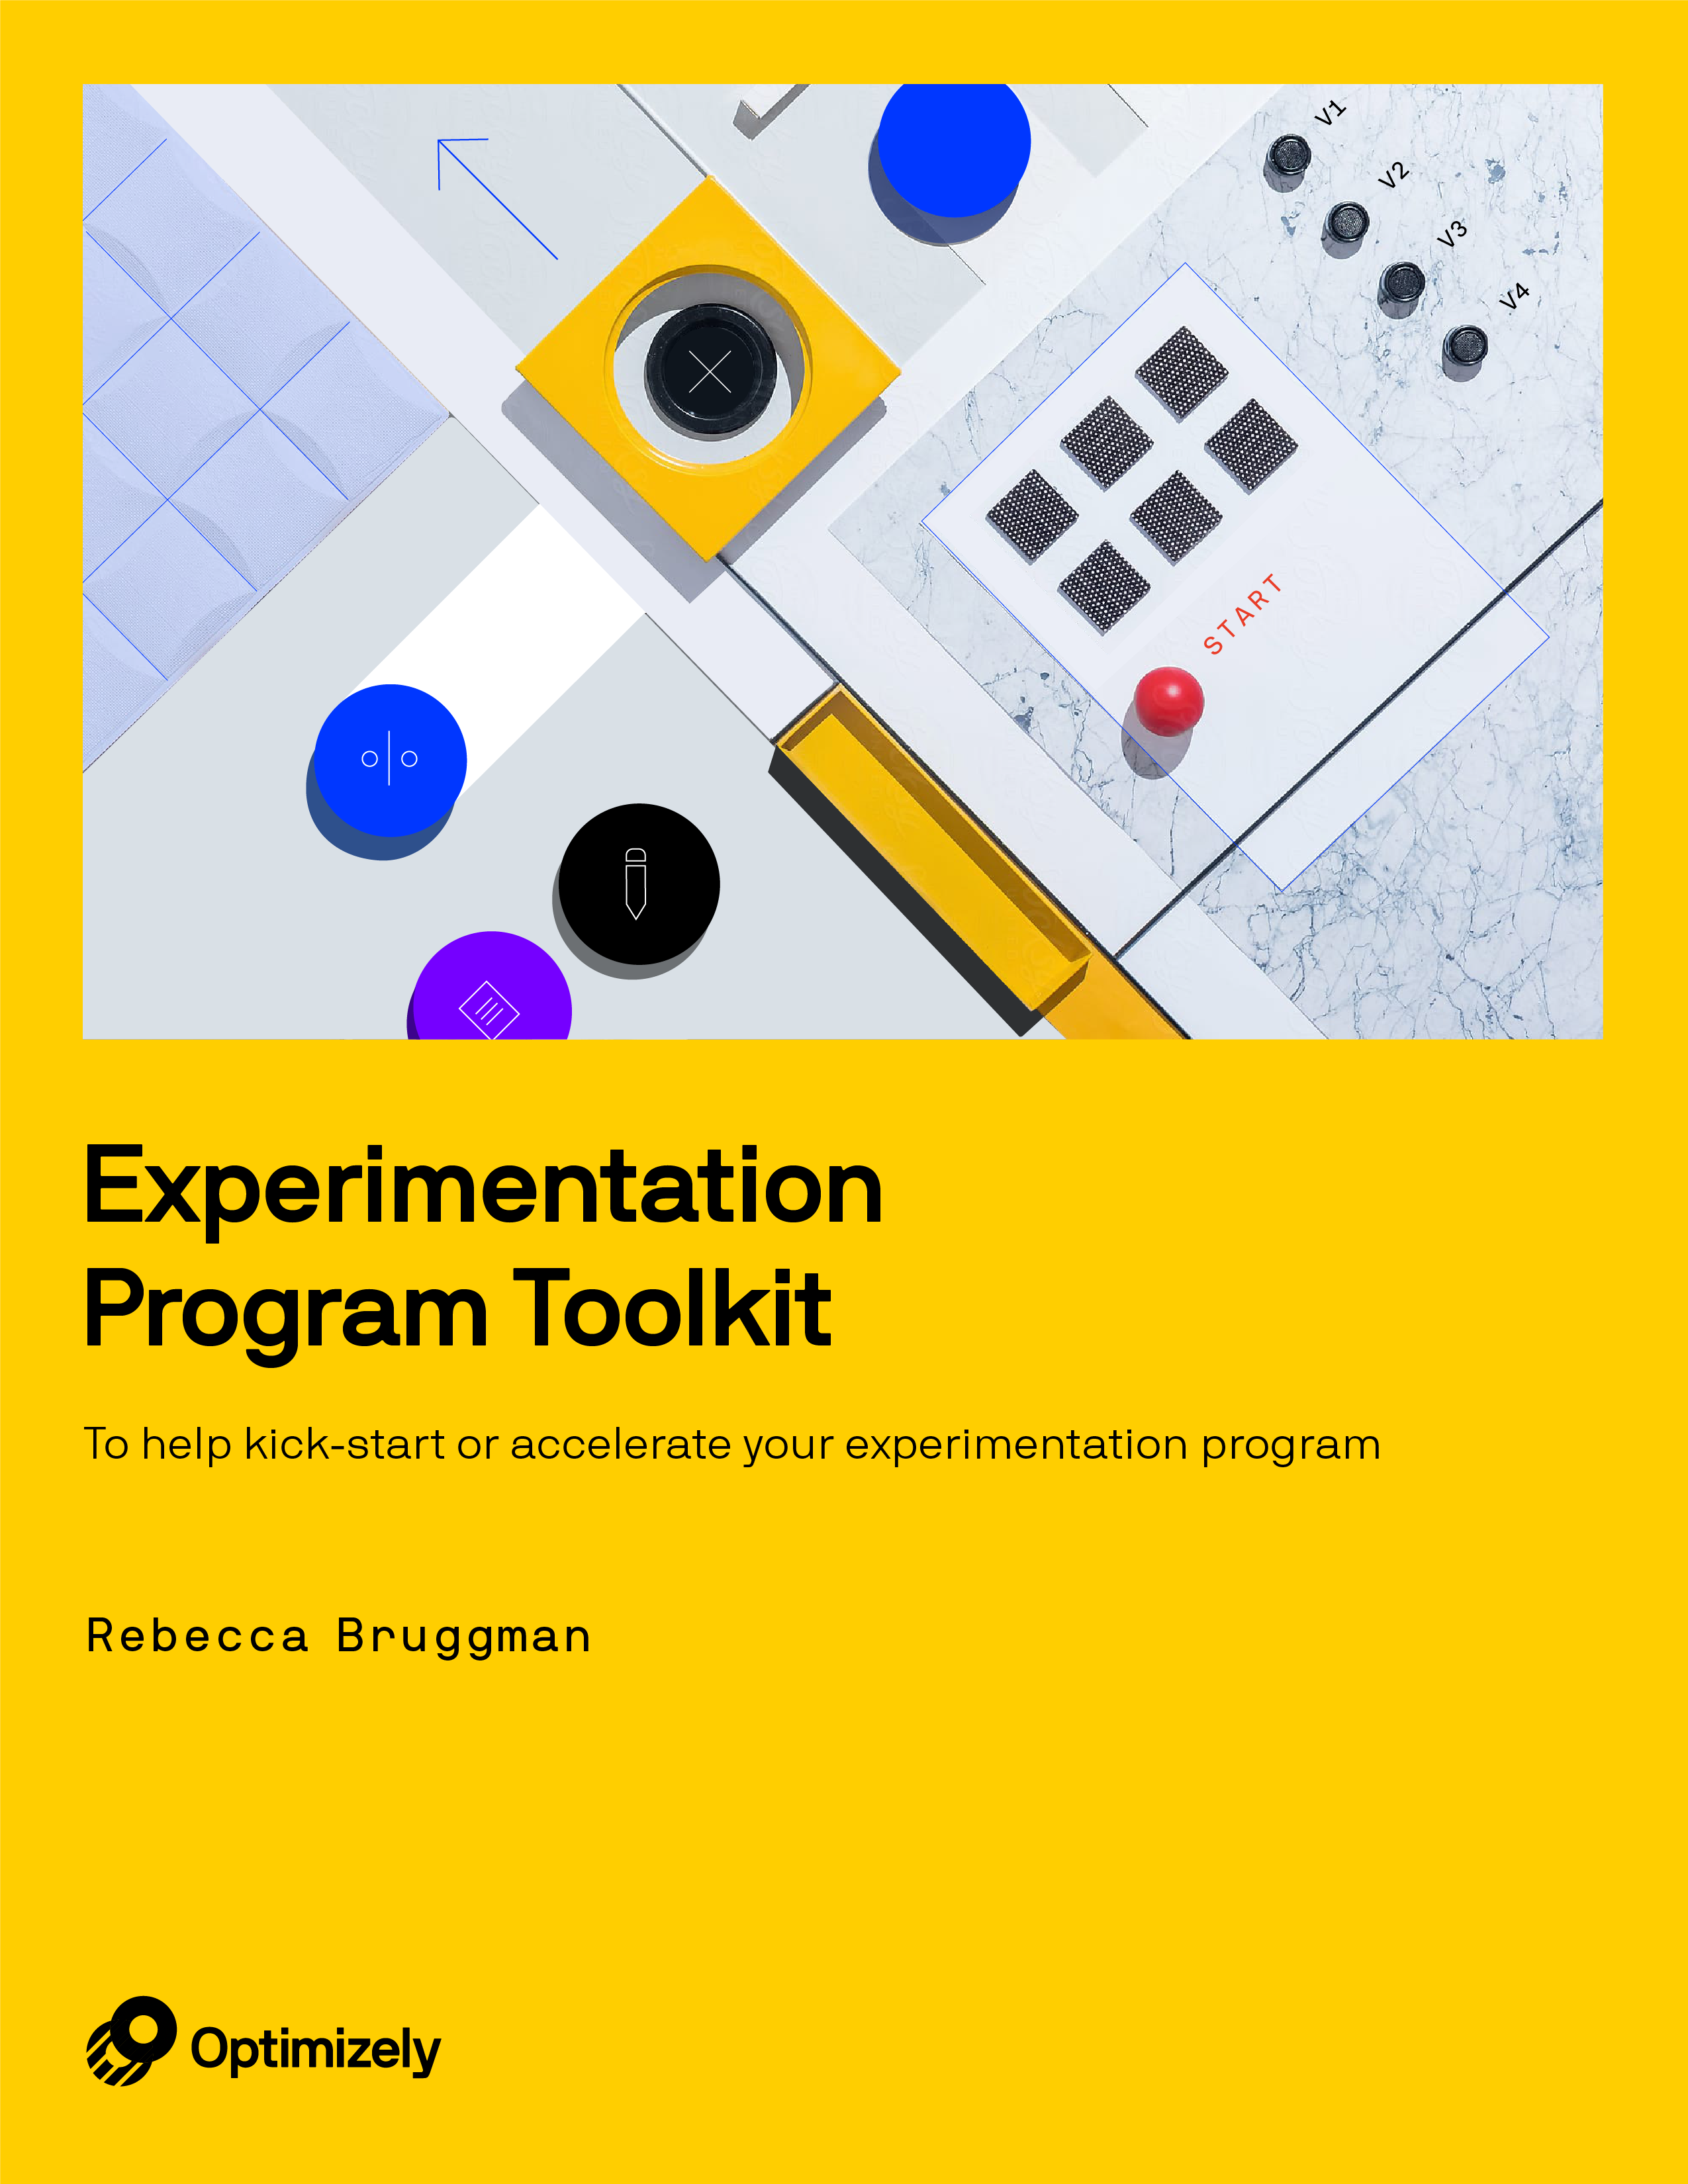 Experimentation Program Toolkit [Free Templates]